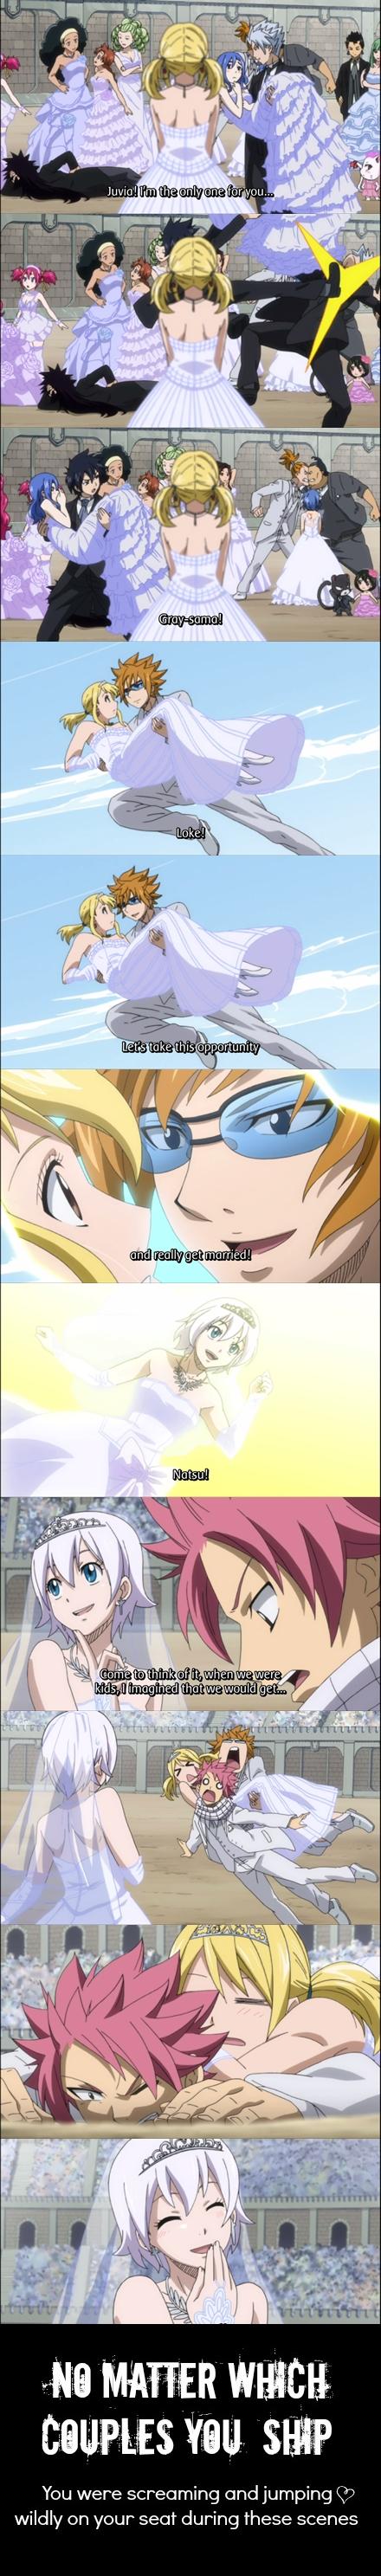 Demotivational Poster Image #1391372 - Zerochan Anime Image Board